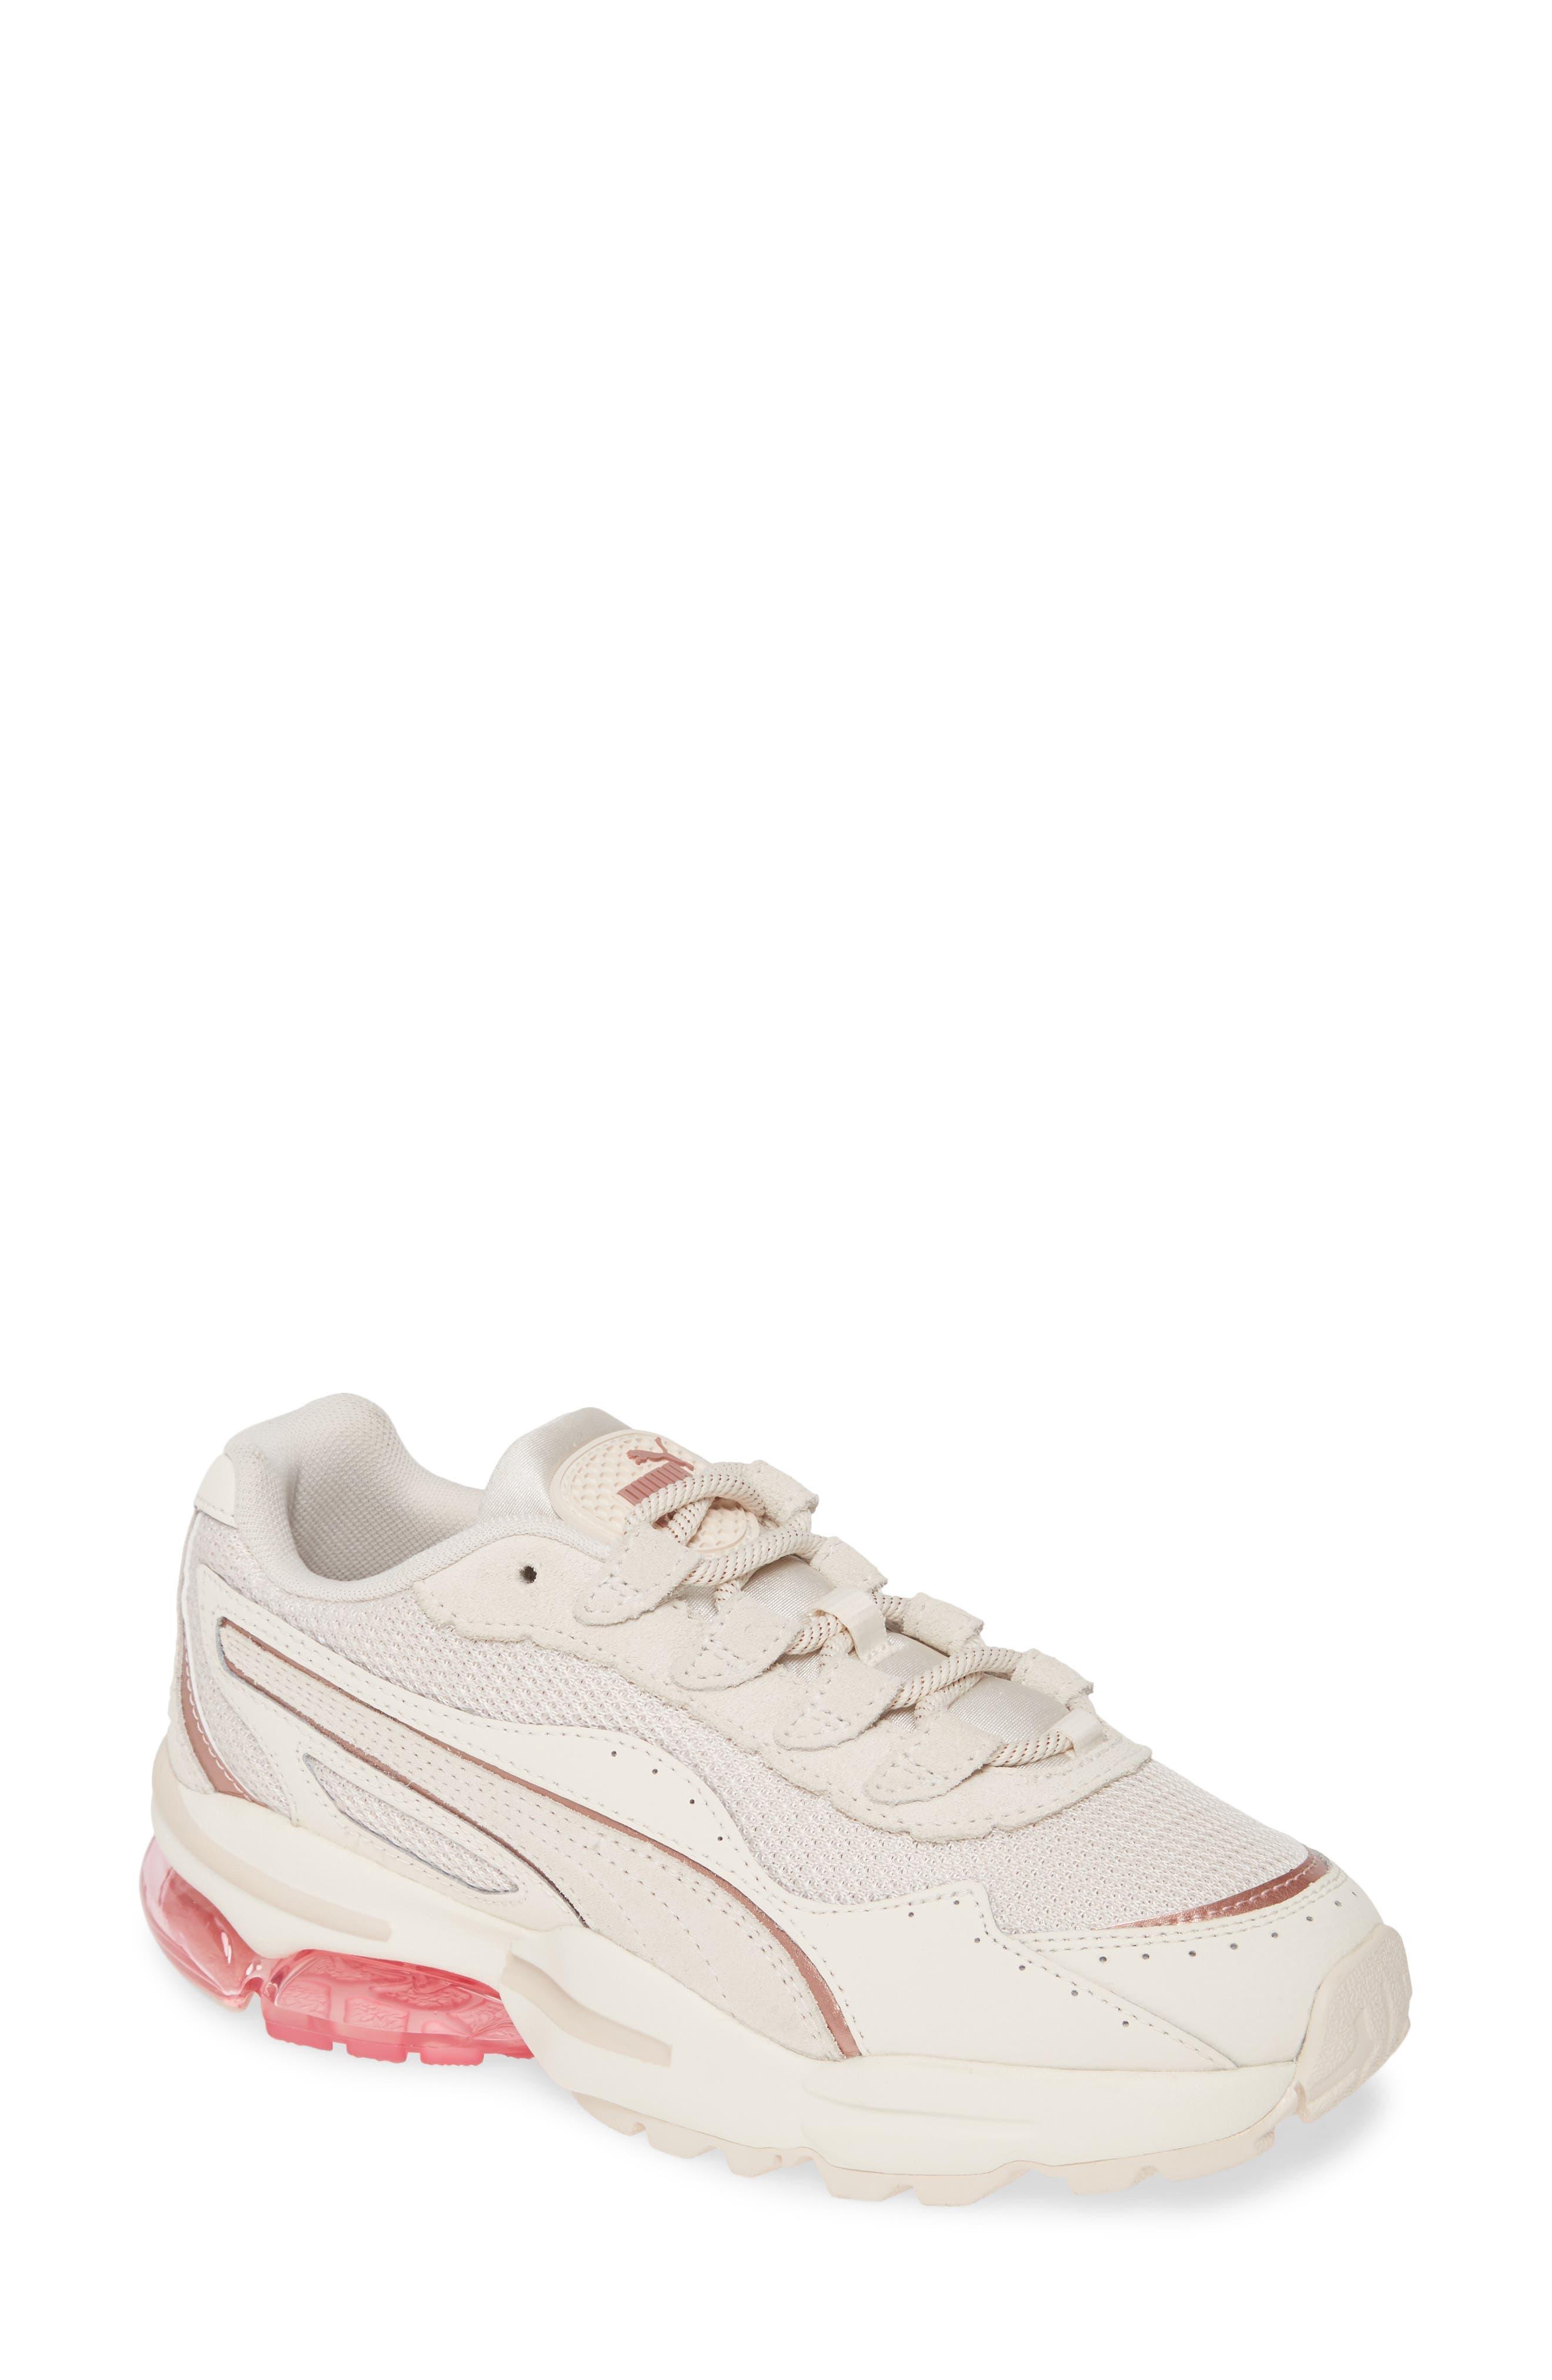 Puma Cell Stellar Soft Sneaker- Ivory